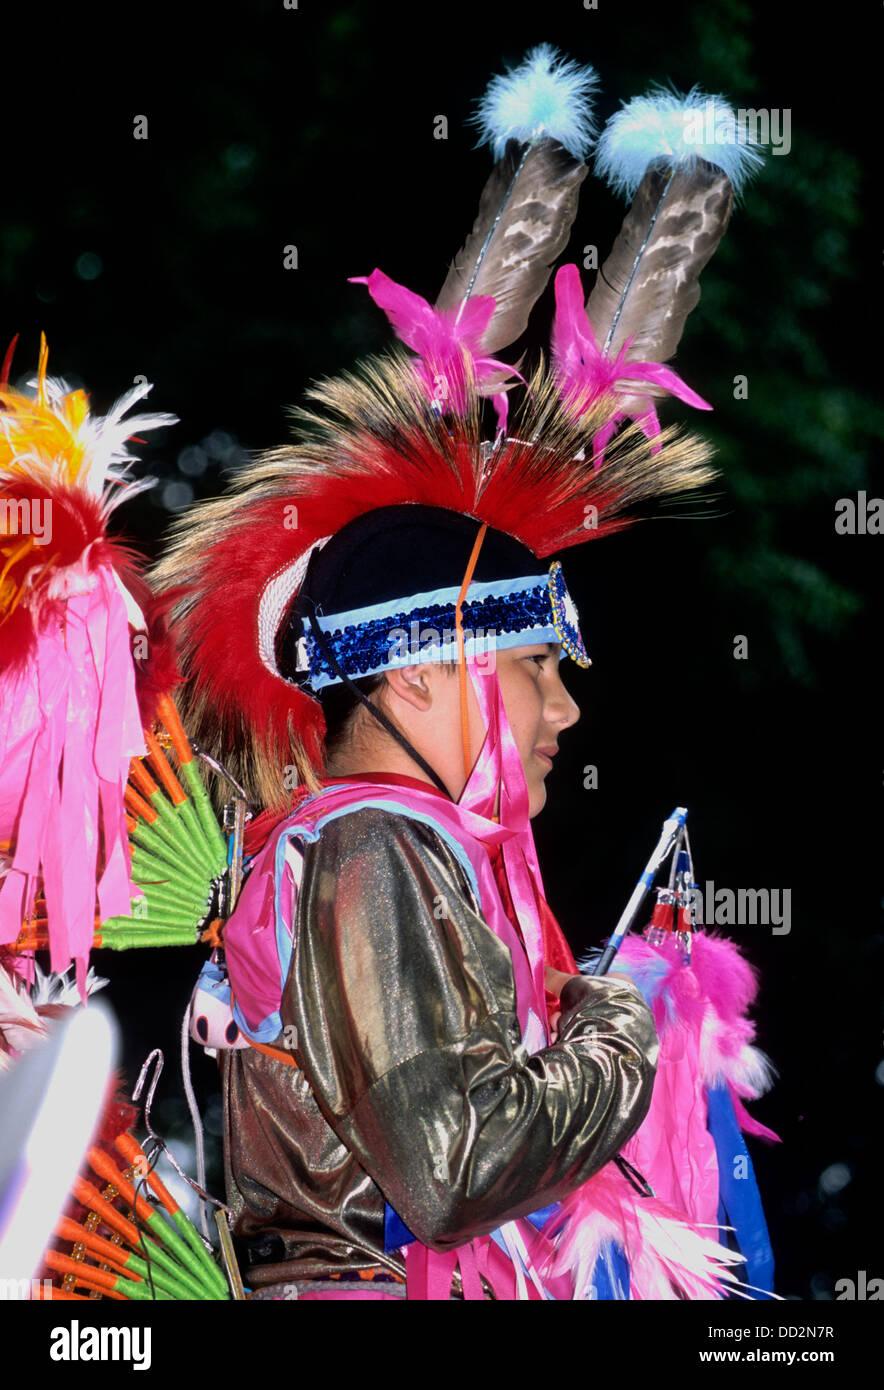 Nez Perce Indian in full dancing regalia at a powwow at the Nez Perce National Historic Park, Lapwai, ID - Stock Image